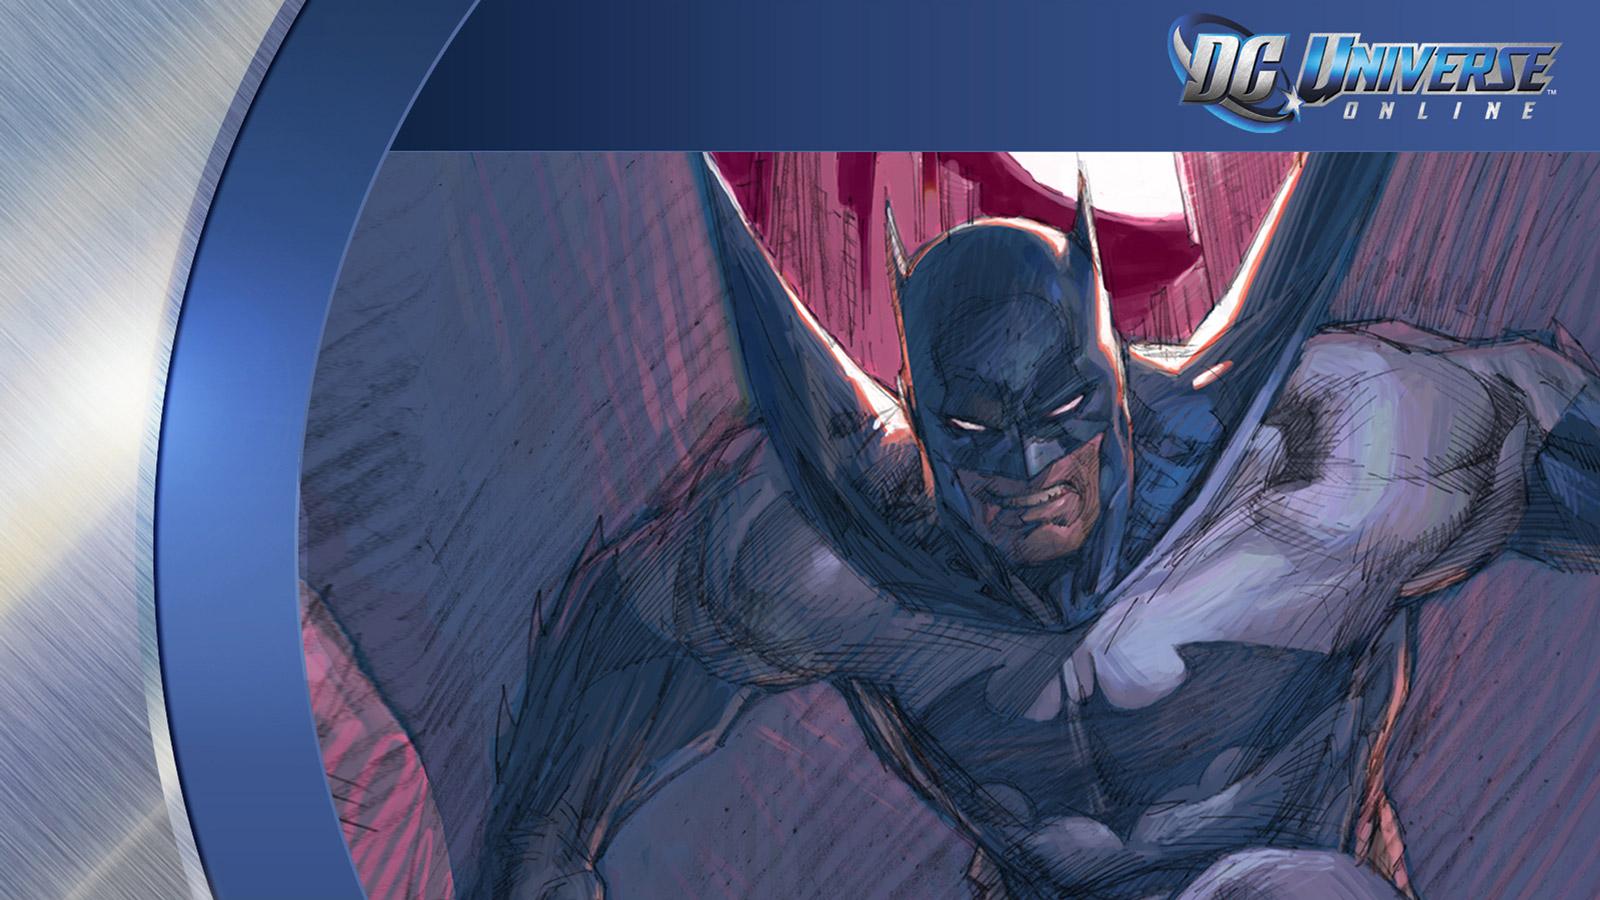 Free DC Universe Online Wallpaper in 1600x900